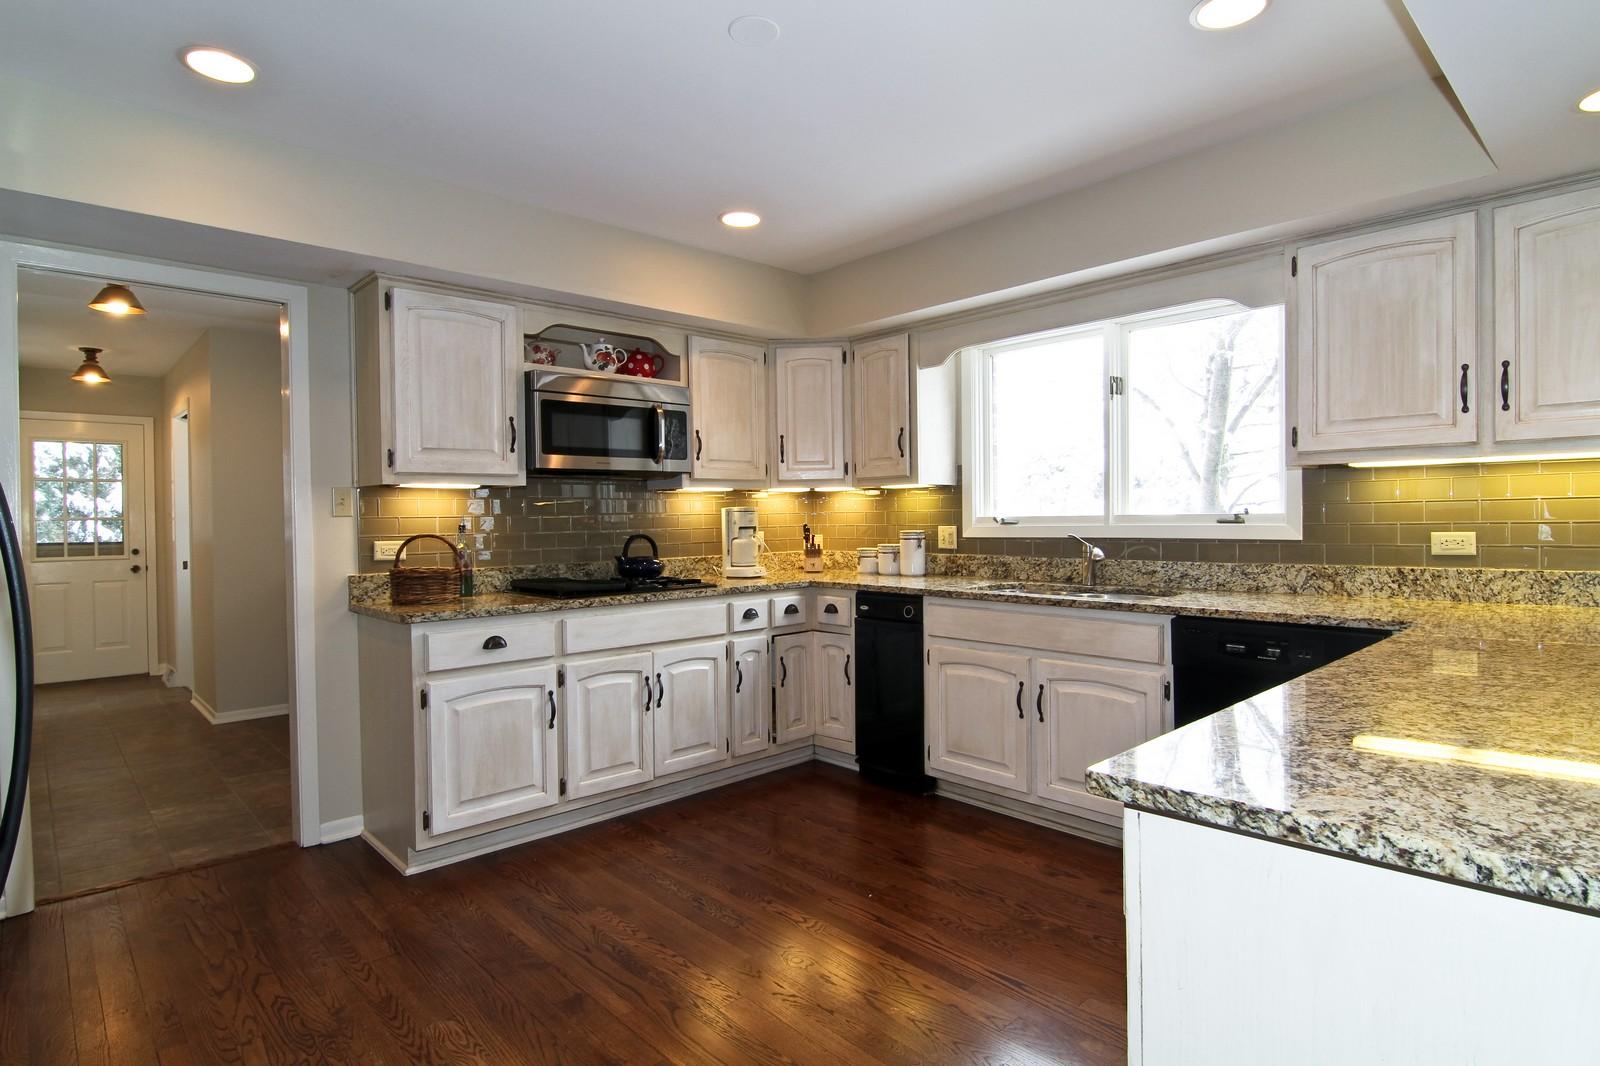 Real Estate Photography - 11554 Ridgewood Lane, Burr Ridge, IL, 60527 - Kitchen